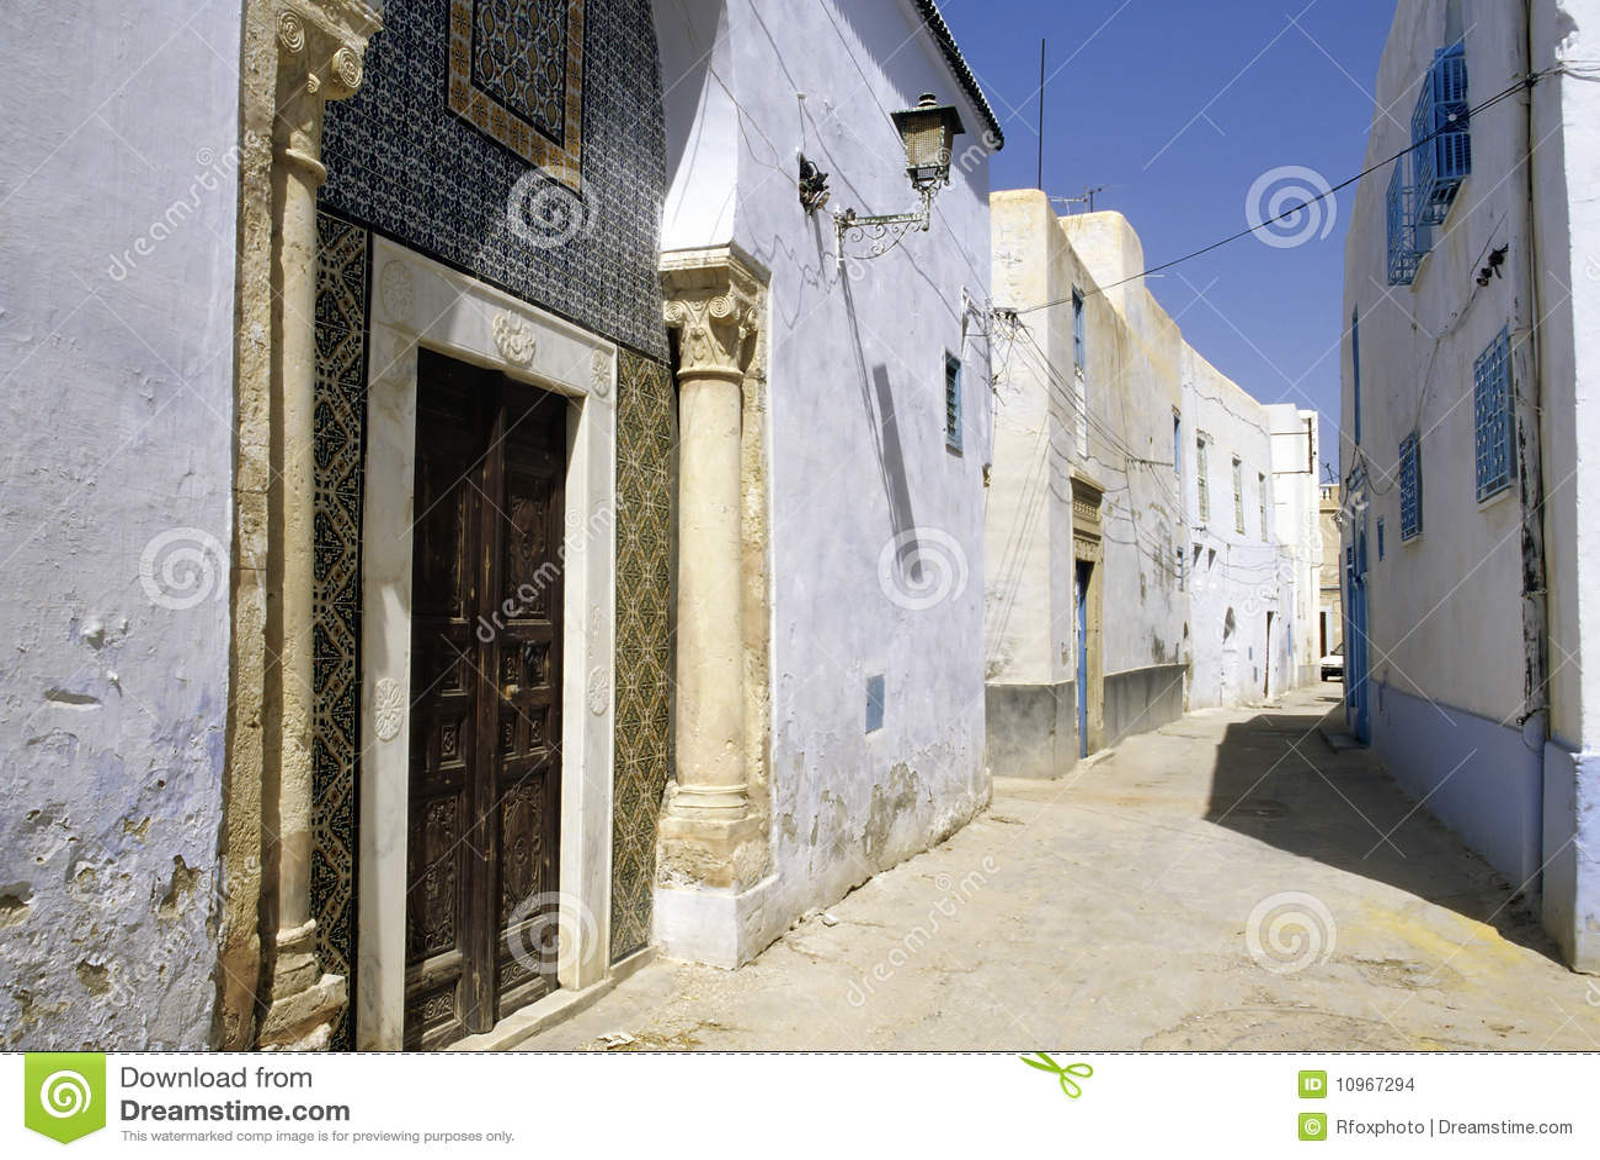 Kairouan Tunisia  City pictures : ... of homes in the UNESCO World Heritage medina of Kairouan Tunisia